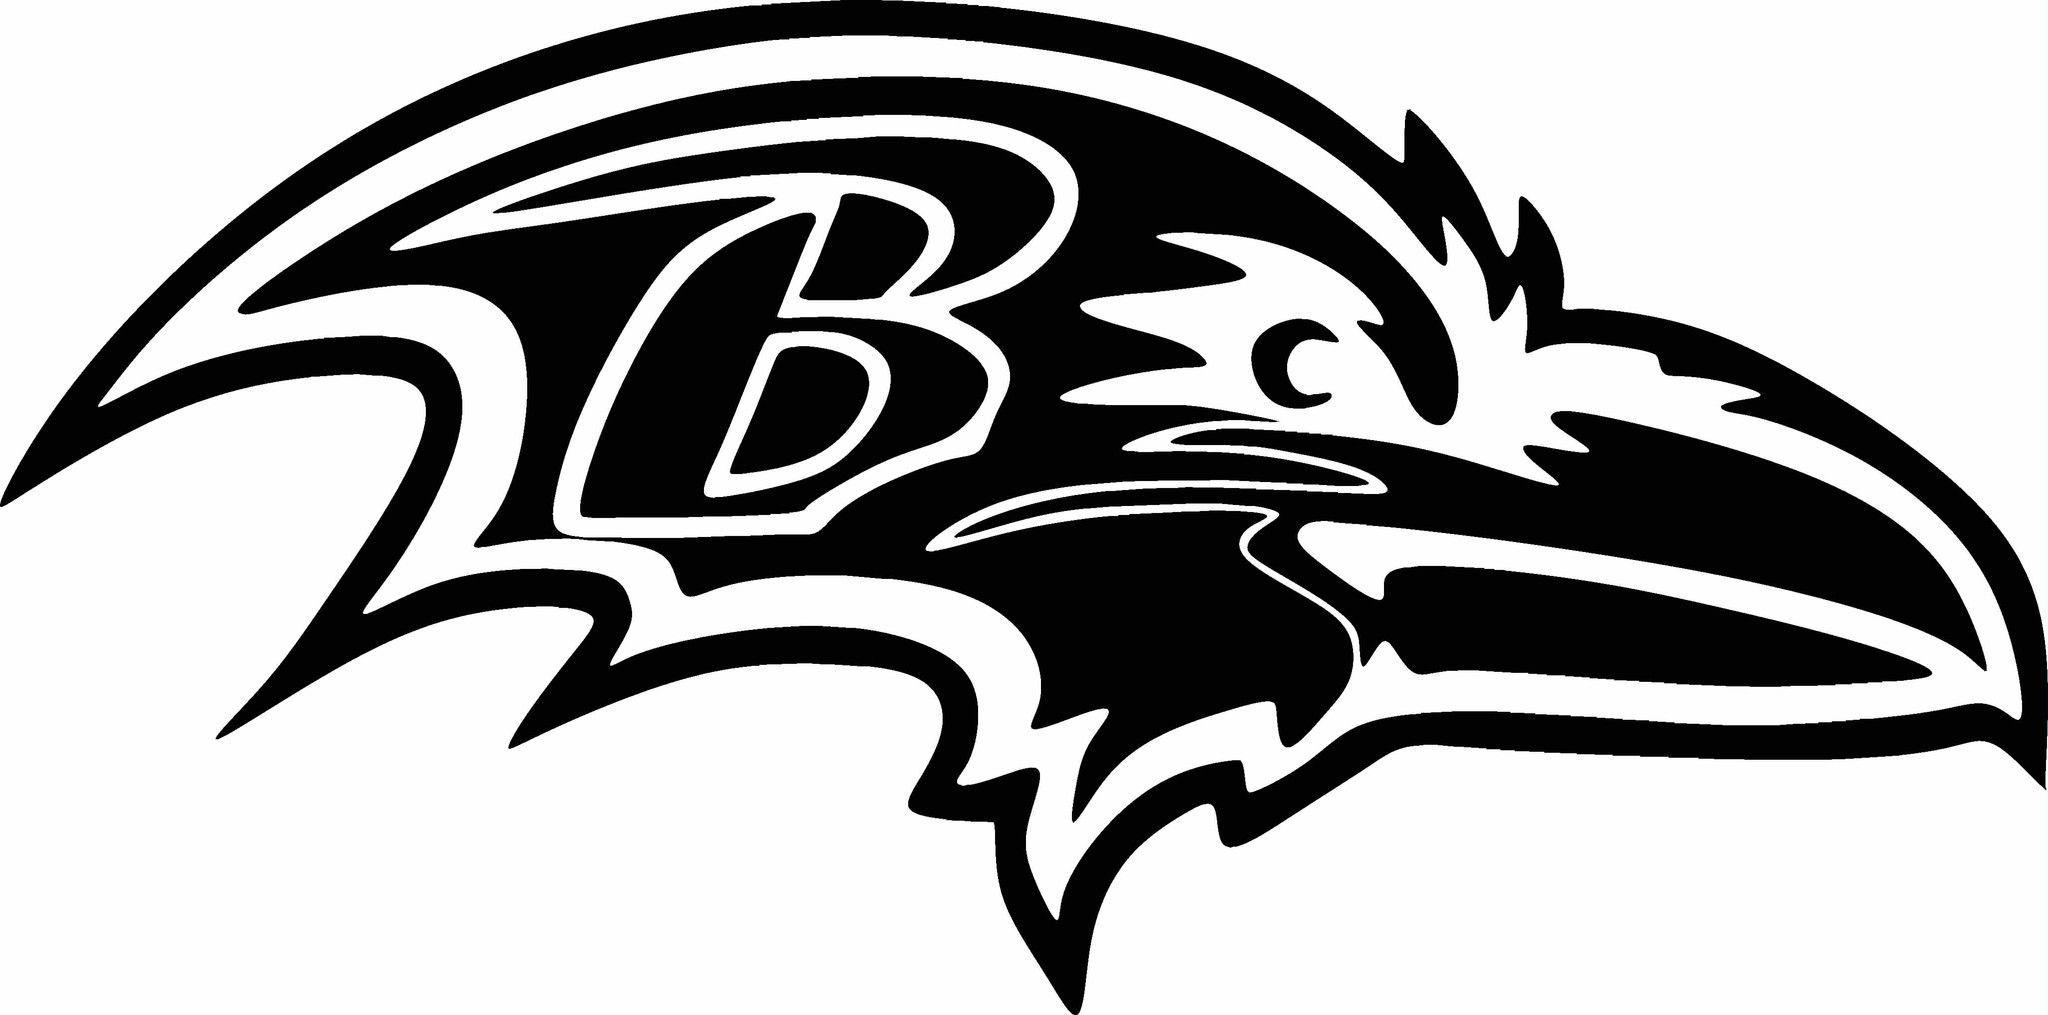 Baltimore Ravens LOGO Vinyl Cut Out Decal Choose your